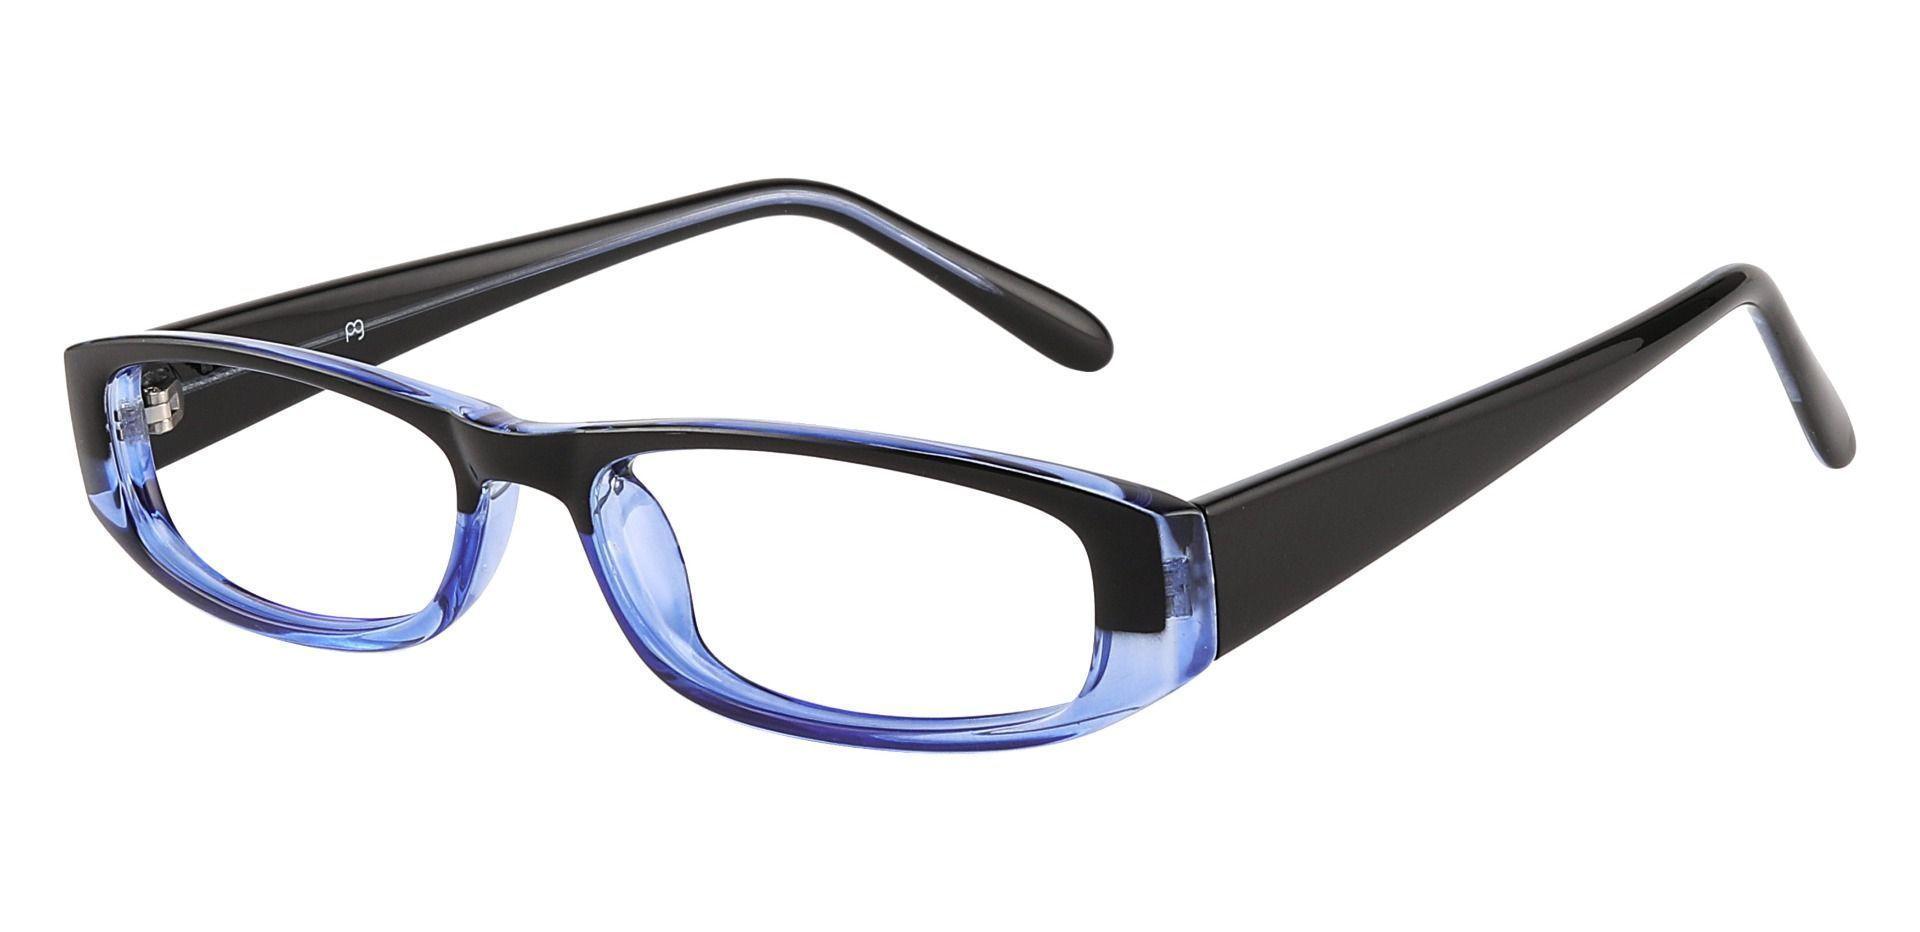 Elgin Rectangle Single Vision Glasses - Blue